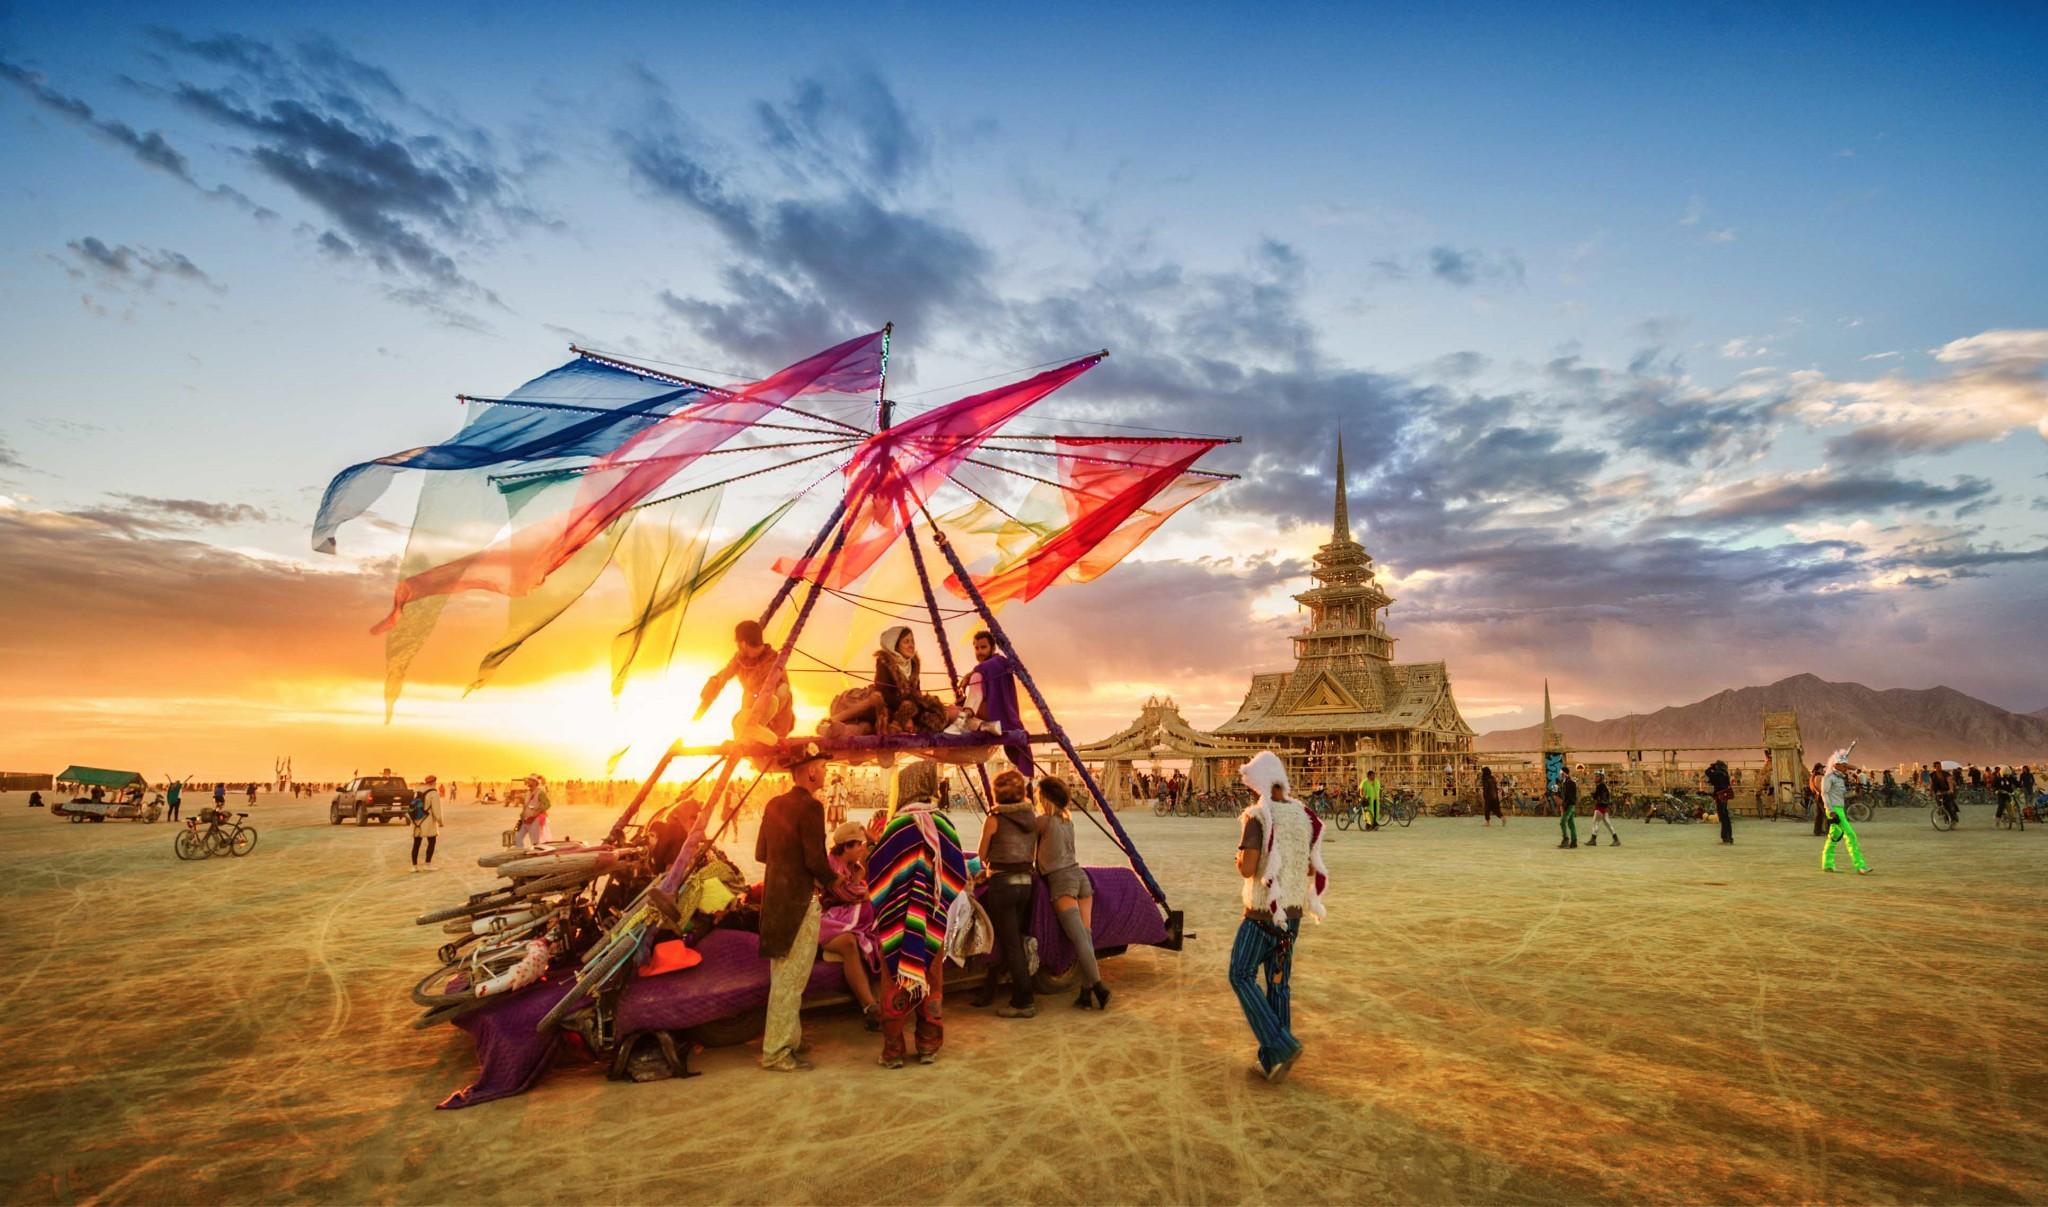 Photo: A cool, crisp, and welcoming morning at Burning Man...